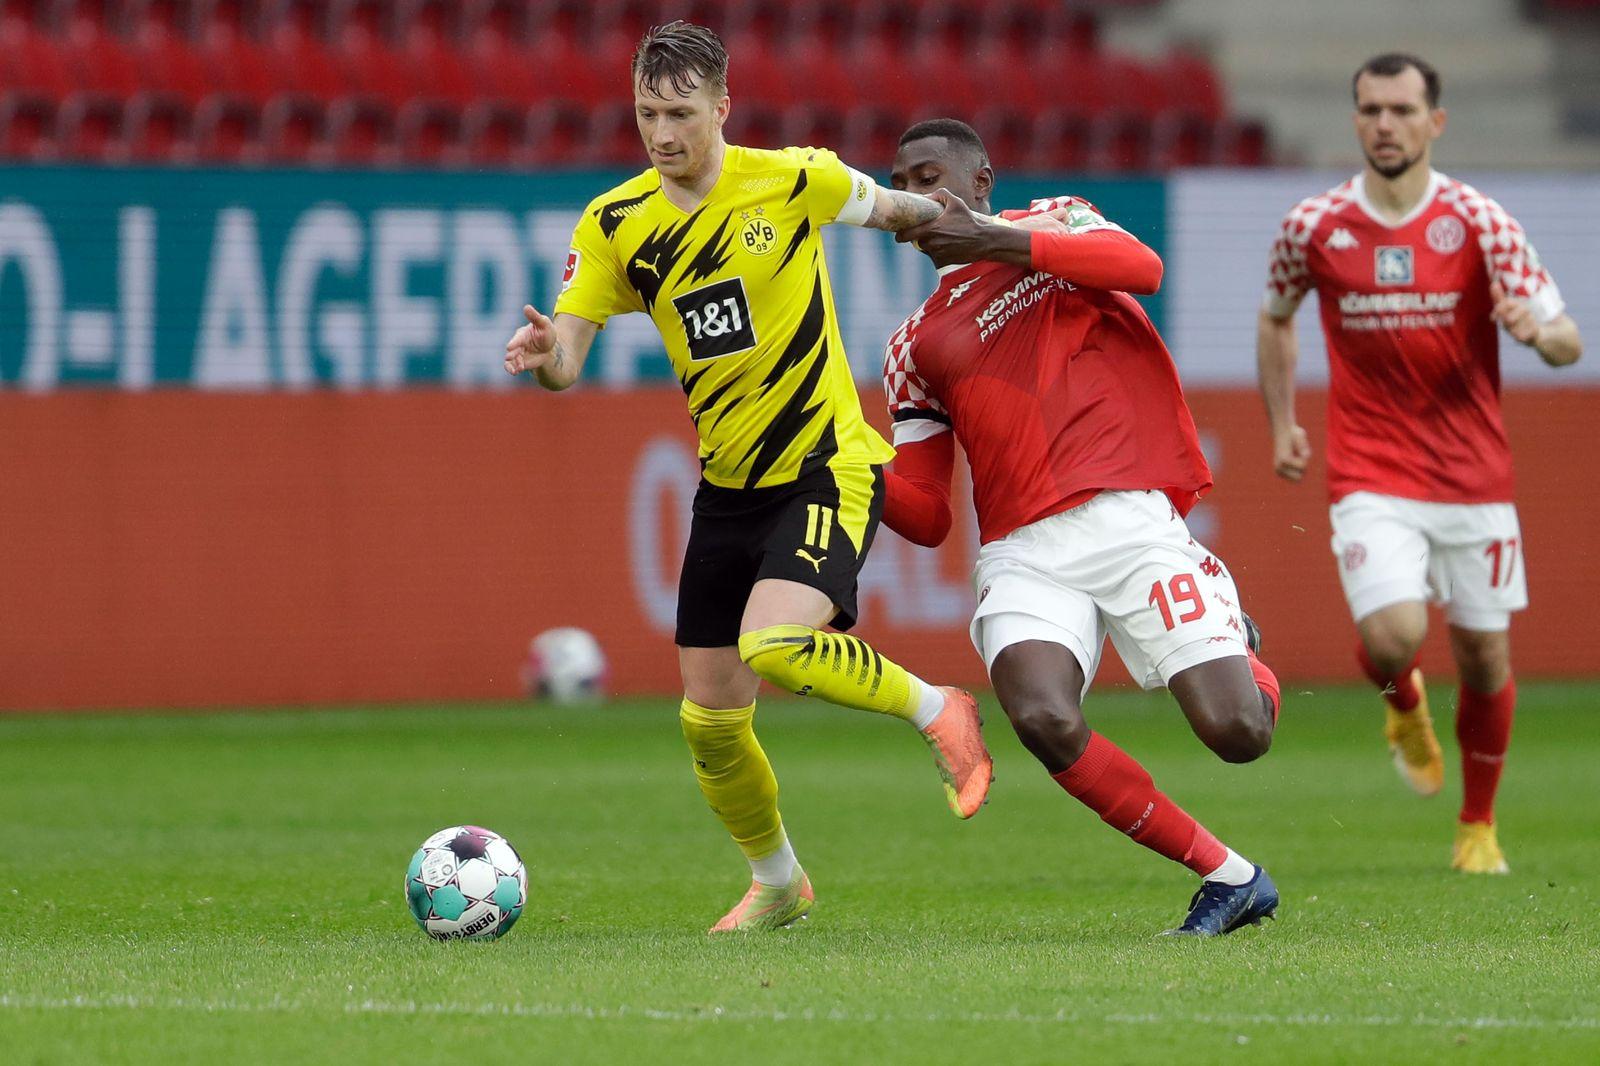 FSV Mainz 05 - Borussia Dortmund